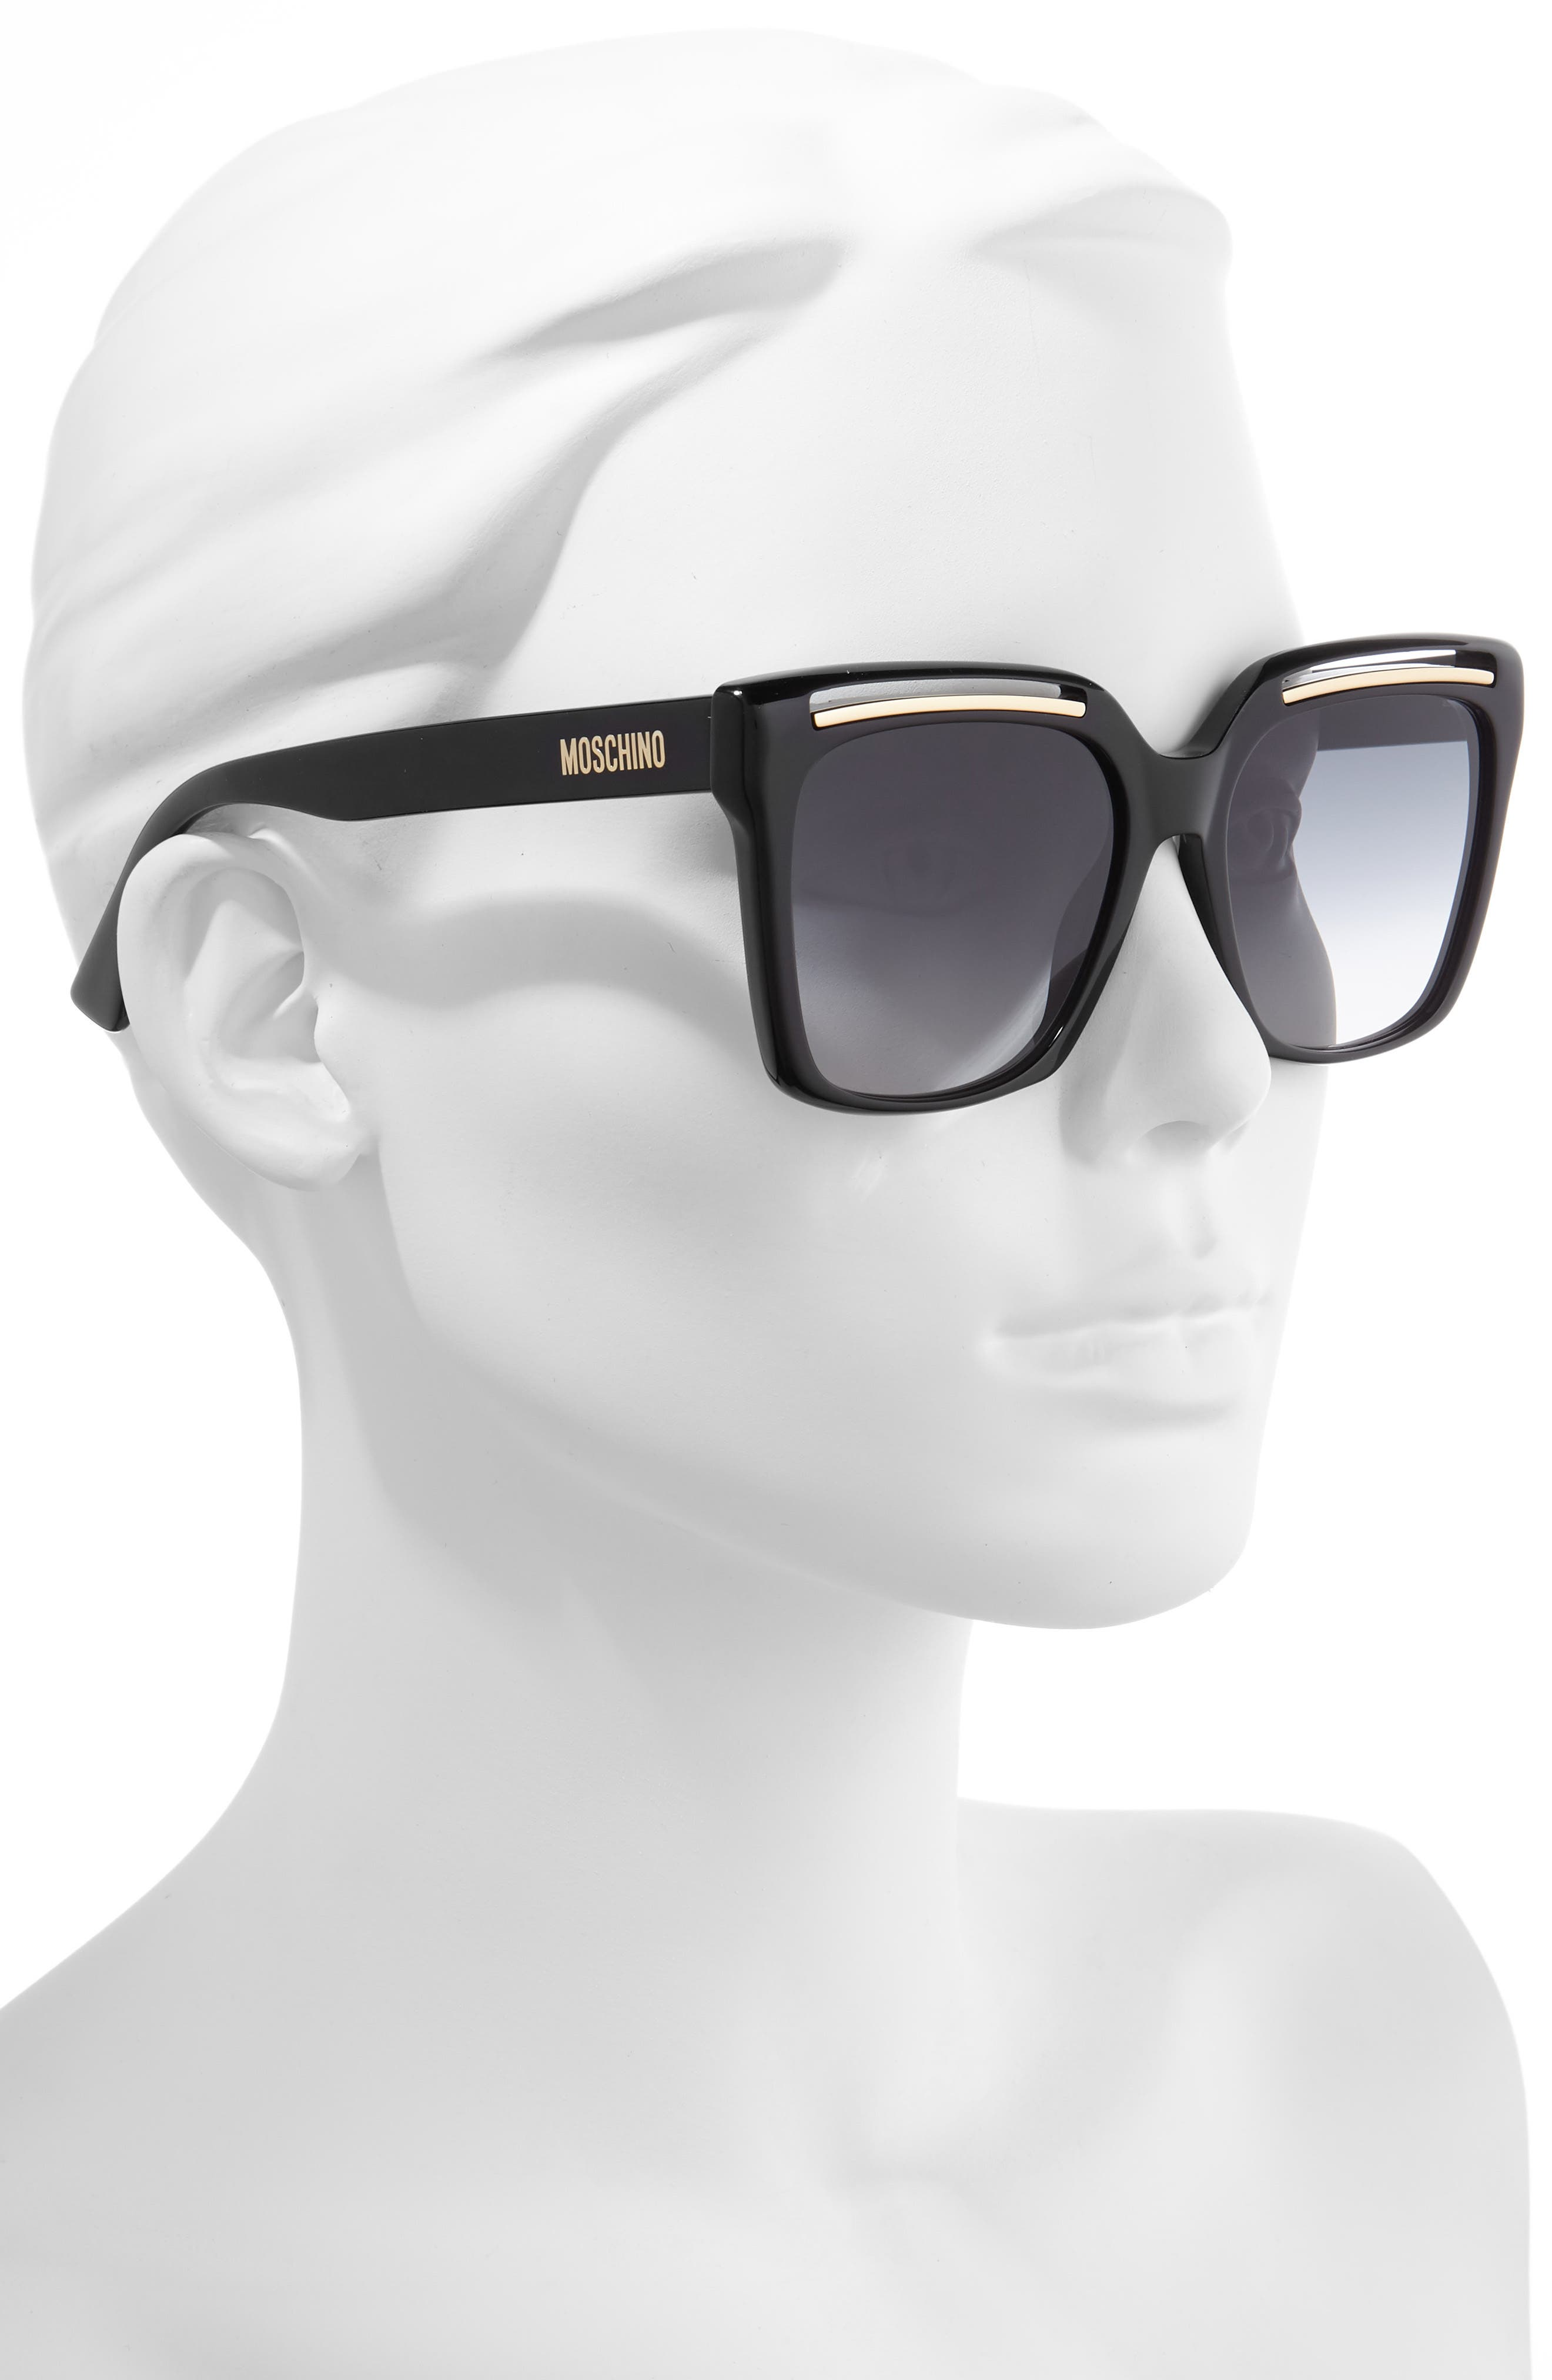 MOSCHINO, 56mm Gradient Square Sunglasses, Alternate thumbnail 2, color, BLACK